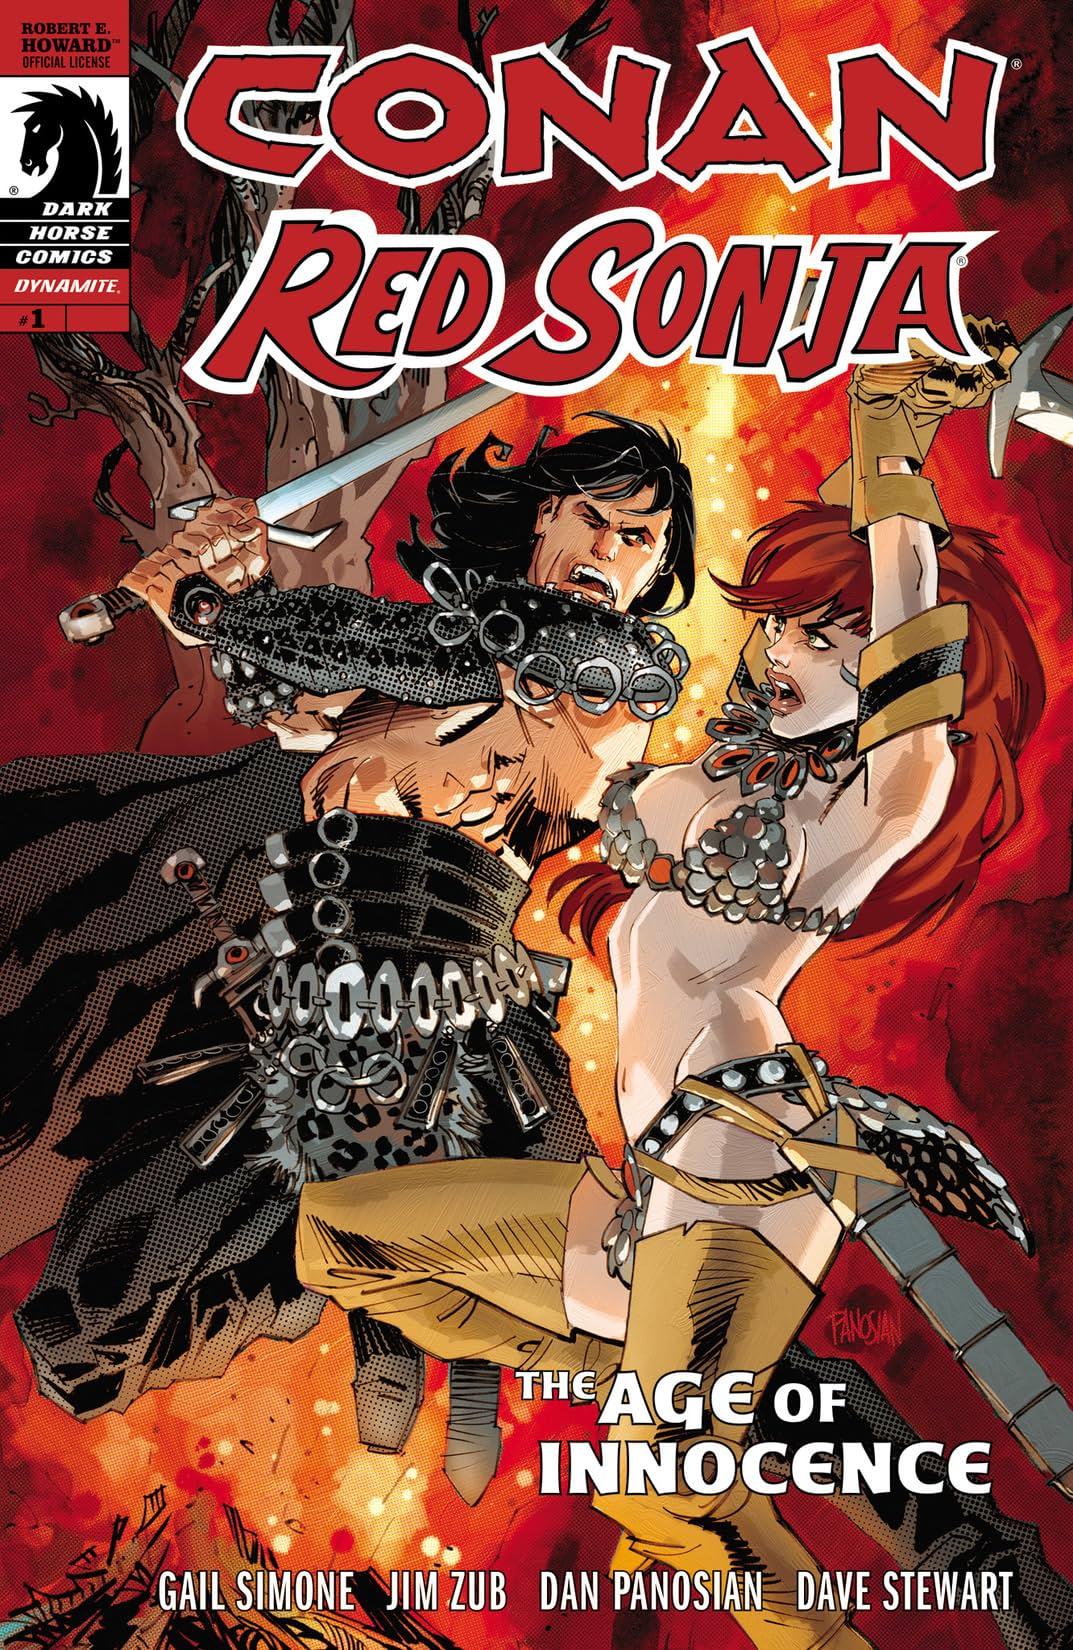 Conan/Red Sonja #1